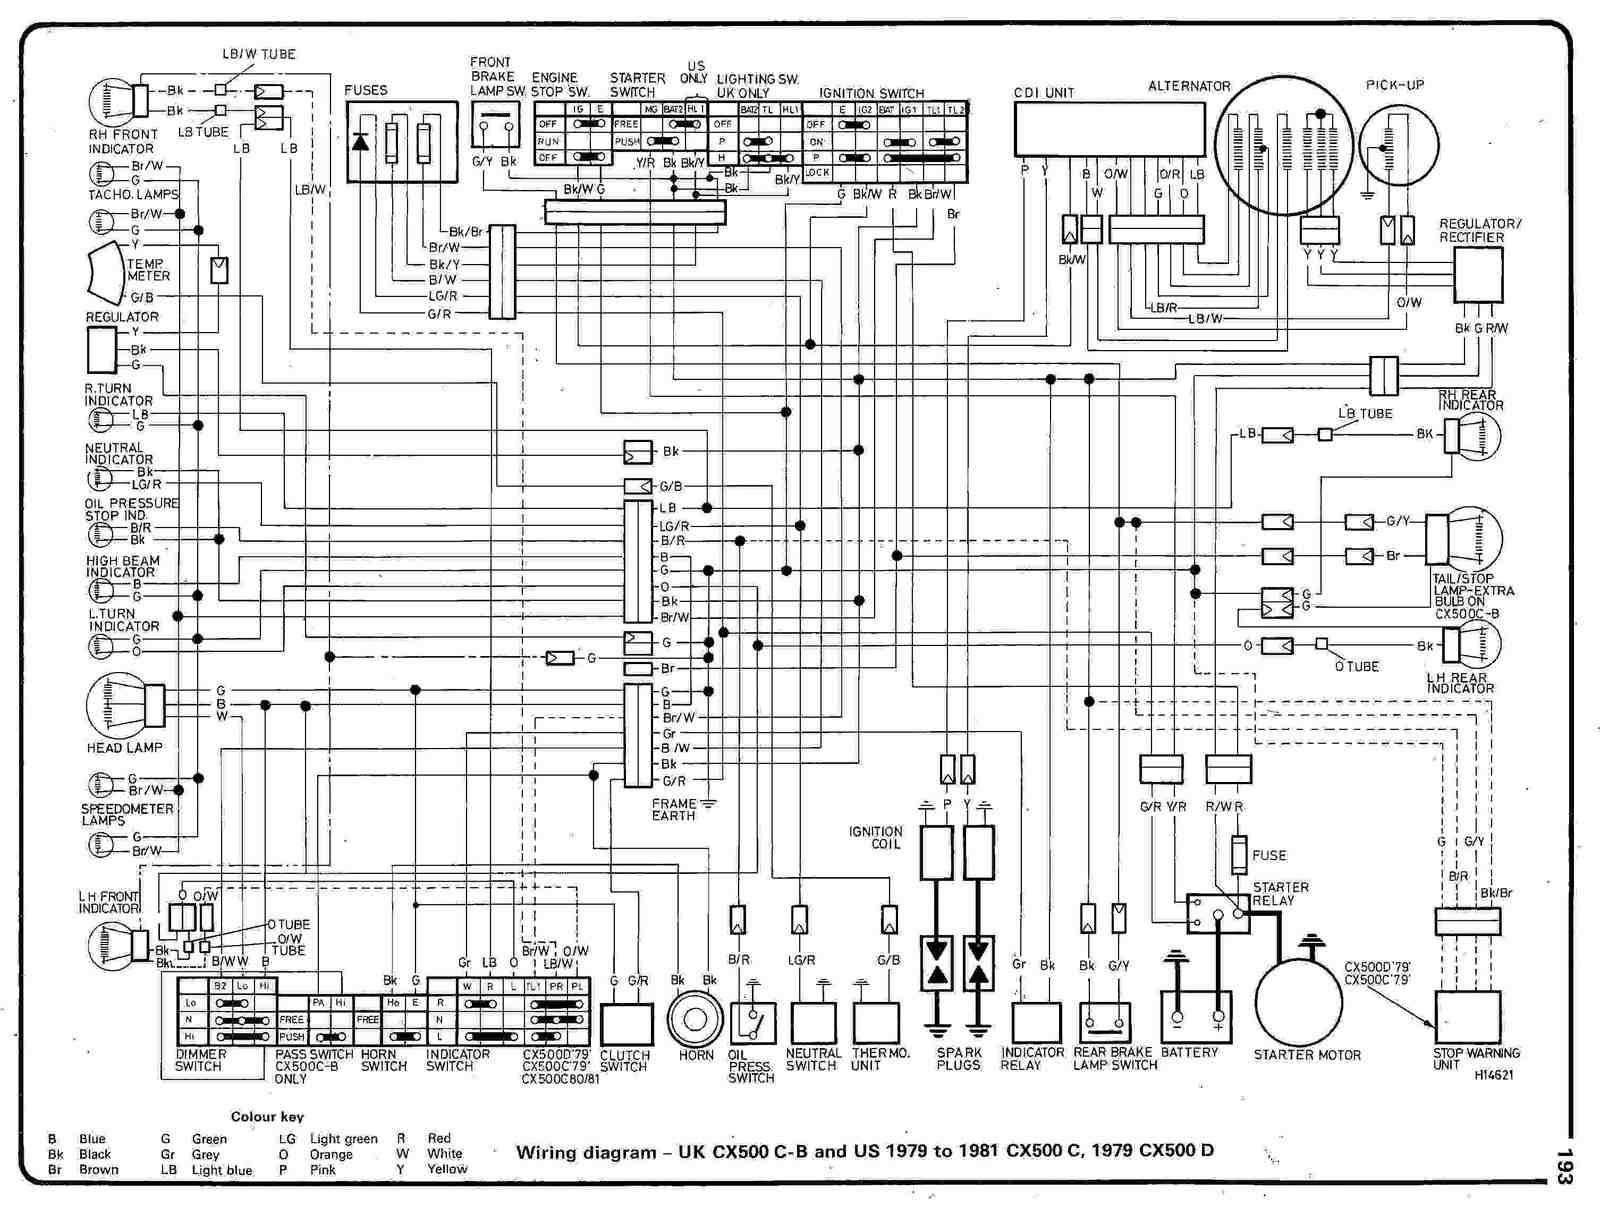 Sl125 Wiring Diagram Explained Diagrams 1971 Honda Z50 Moreover Captivating Sl175 Images Best Image